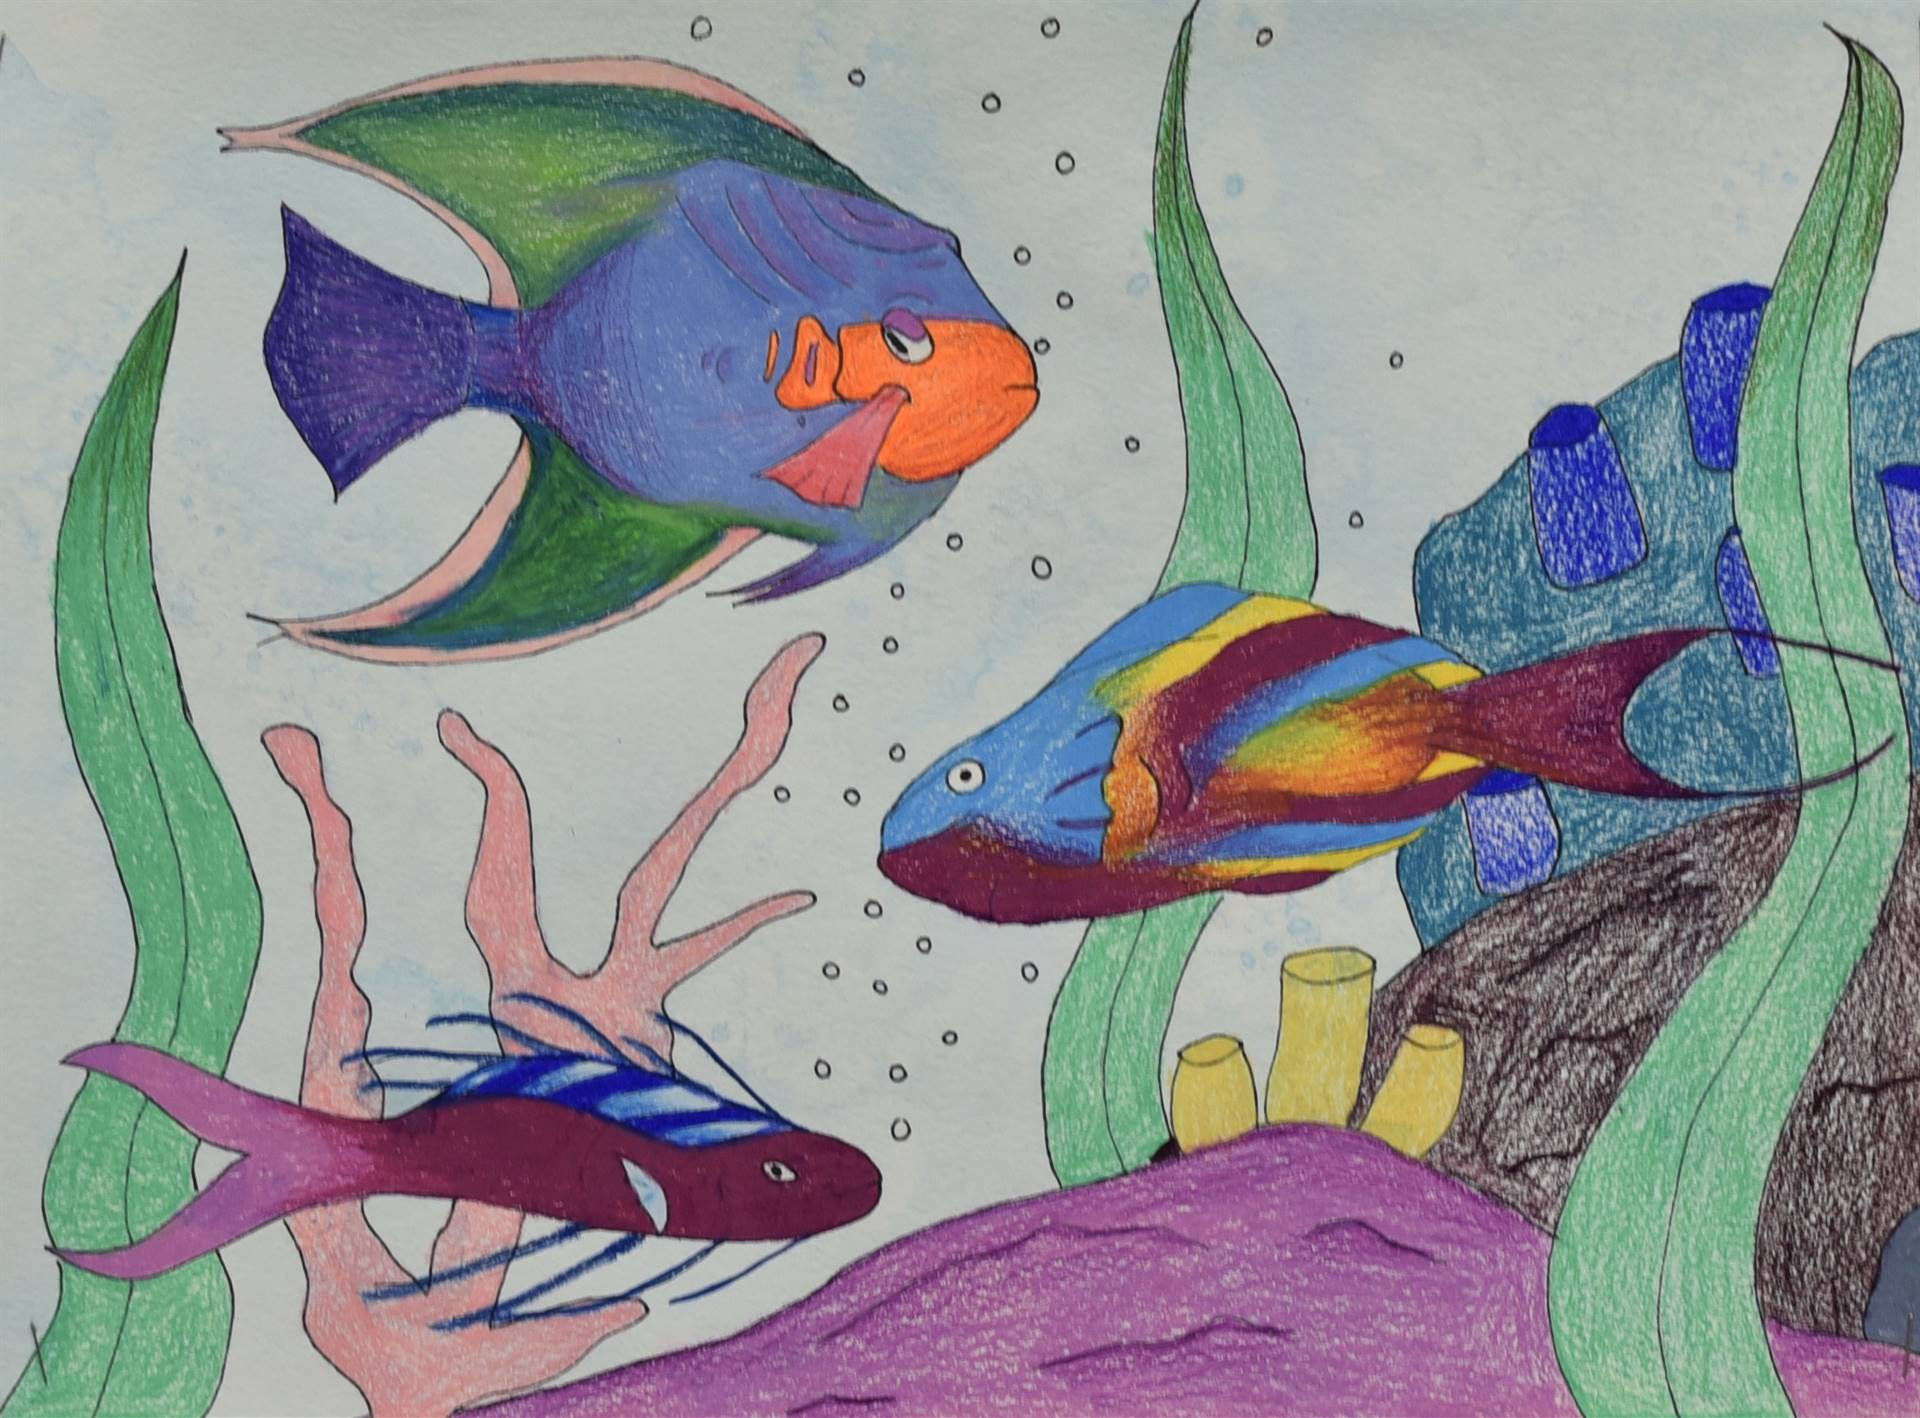 Brecksville-Broadview Hts. Middle School Art Projects 143